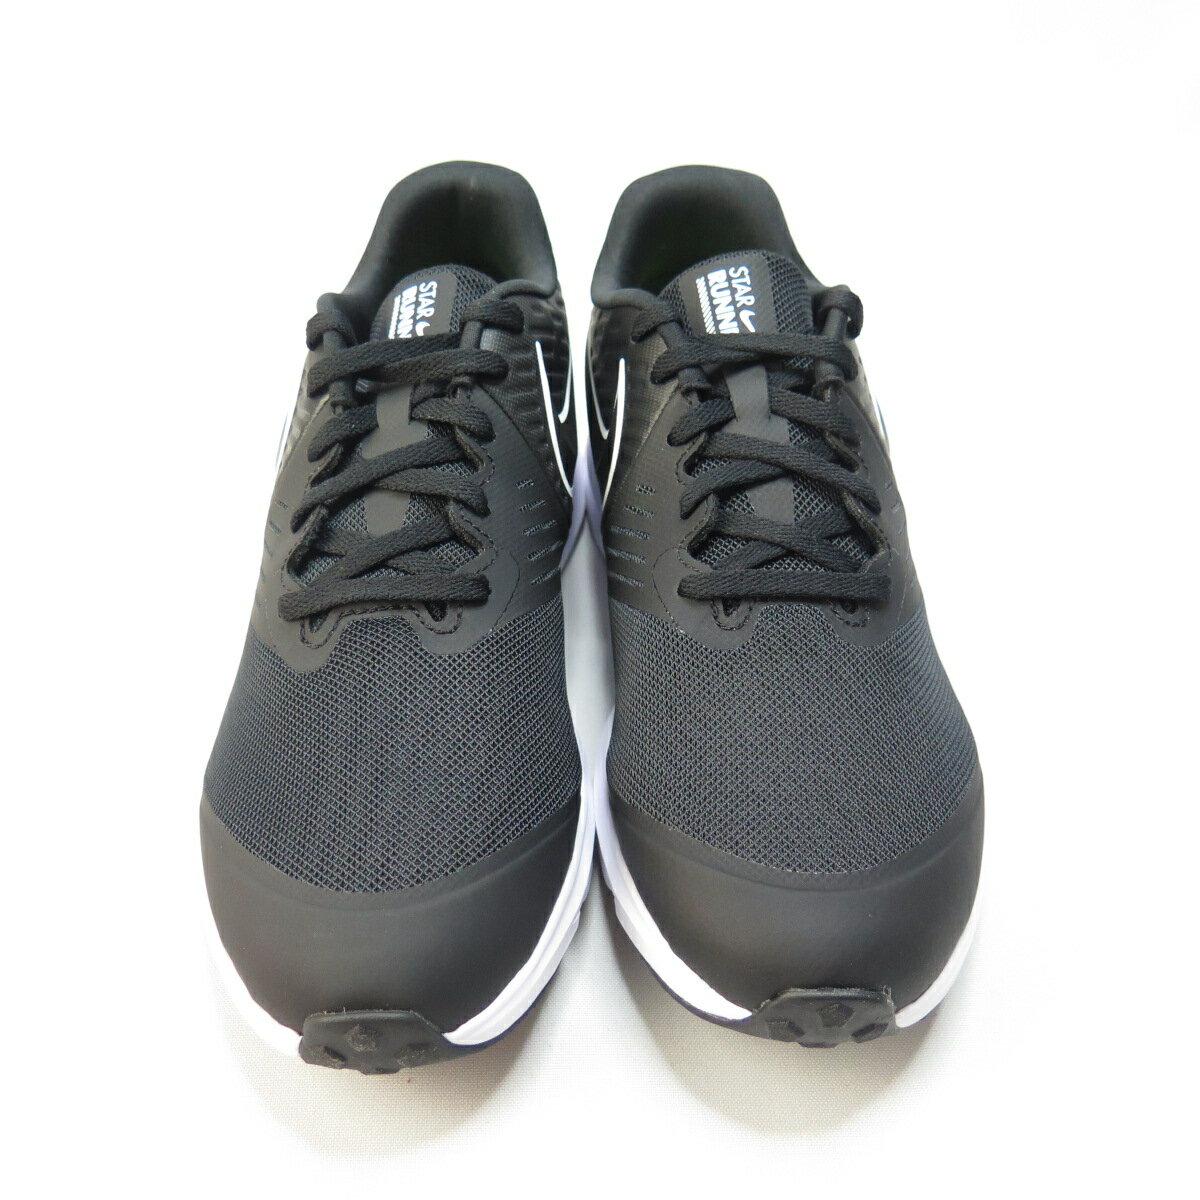 NIKE STAR RUNNER 2 (GS) 慢跑鞋 正品 AQ3542001 大童 黑【iSport愛運動】